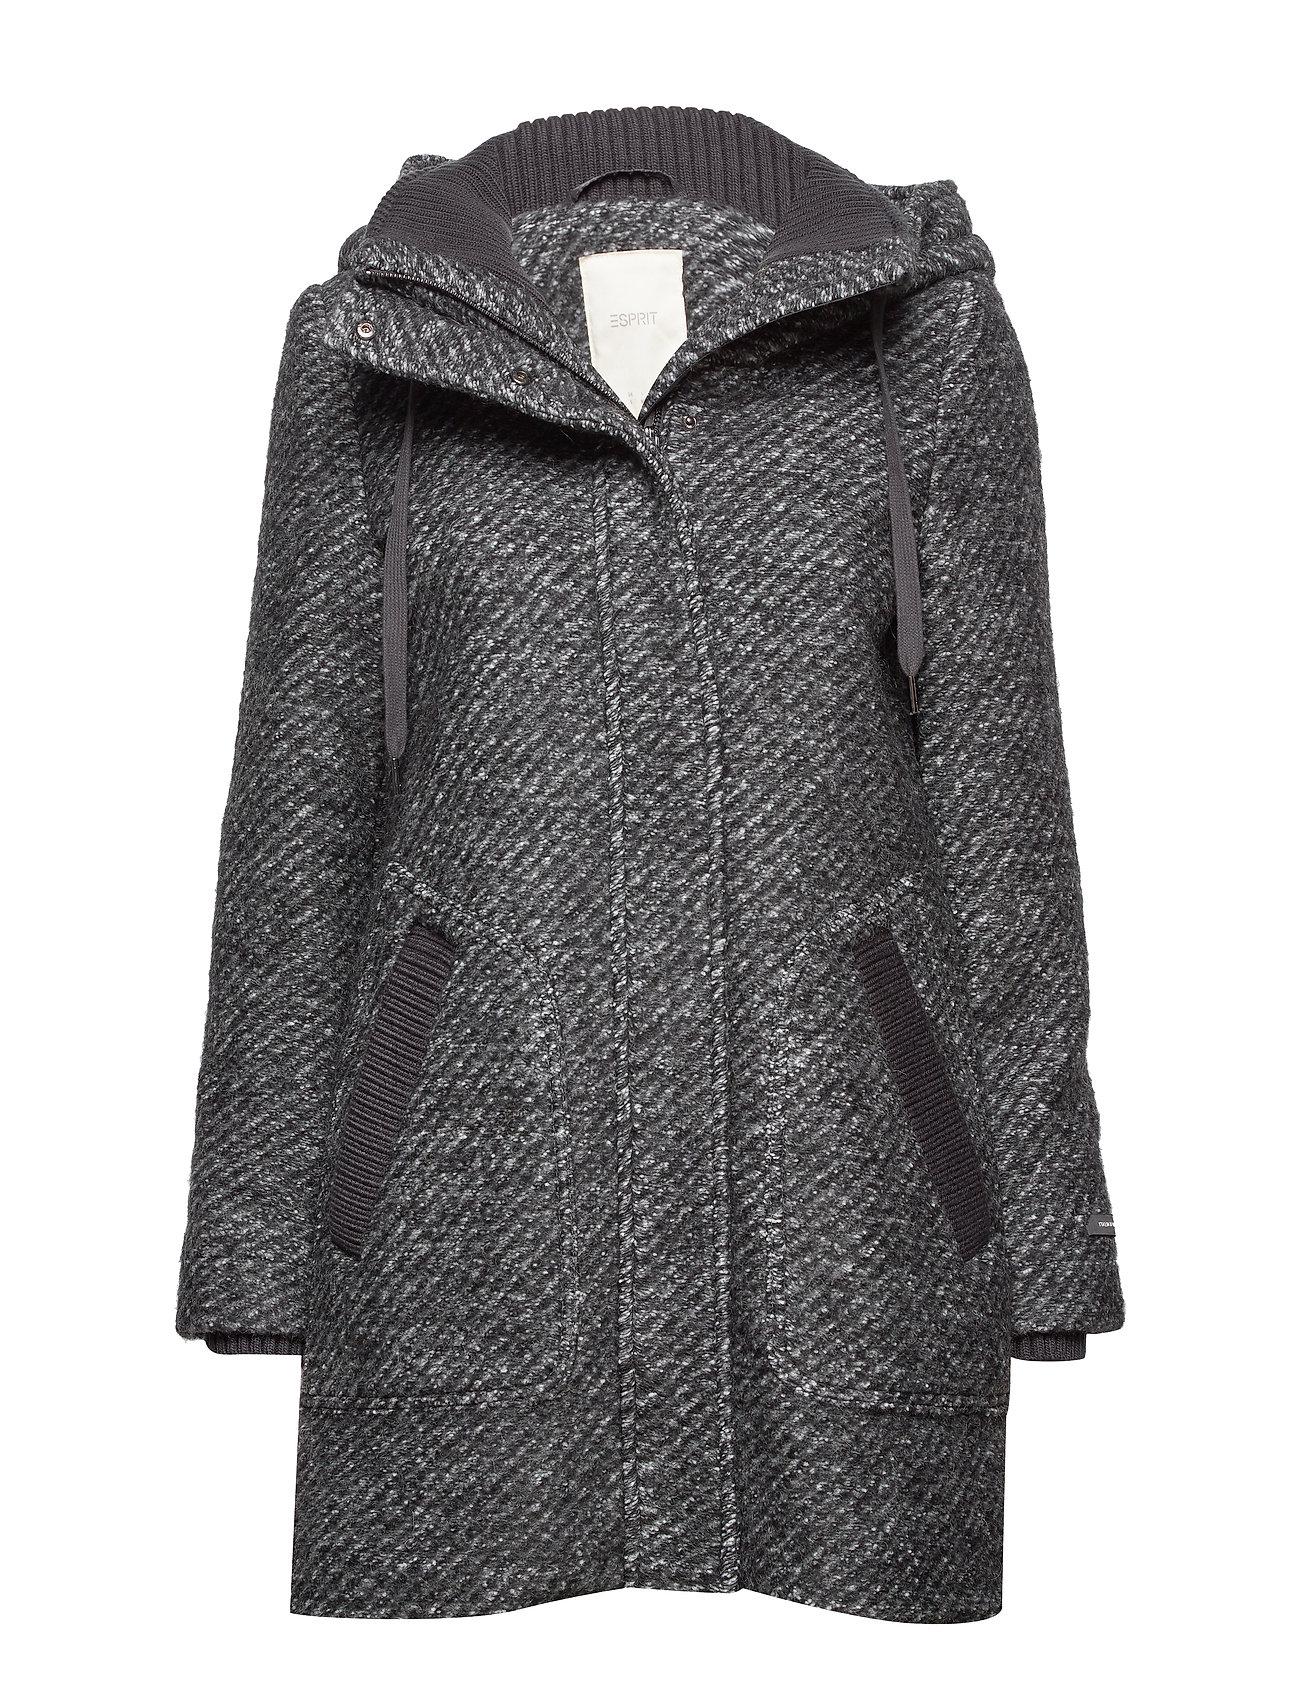 Esprit Casual Coats woven - DARK GREY 5